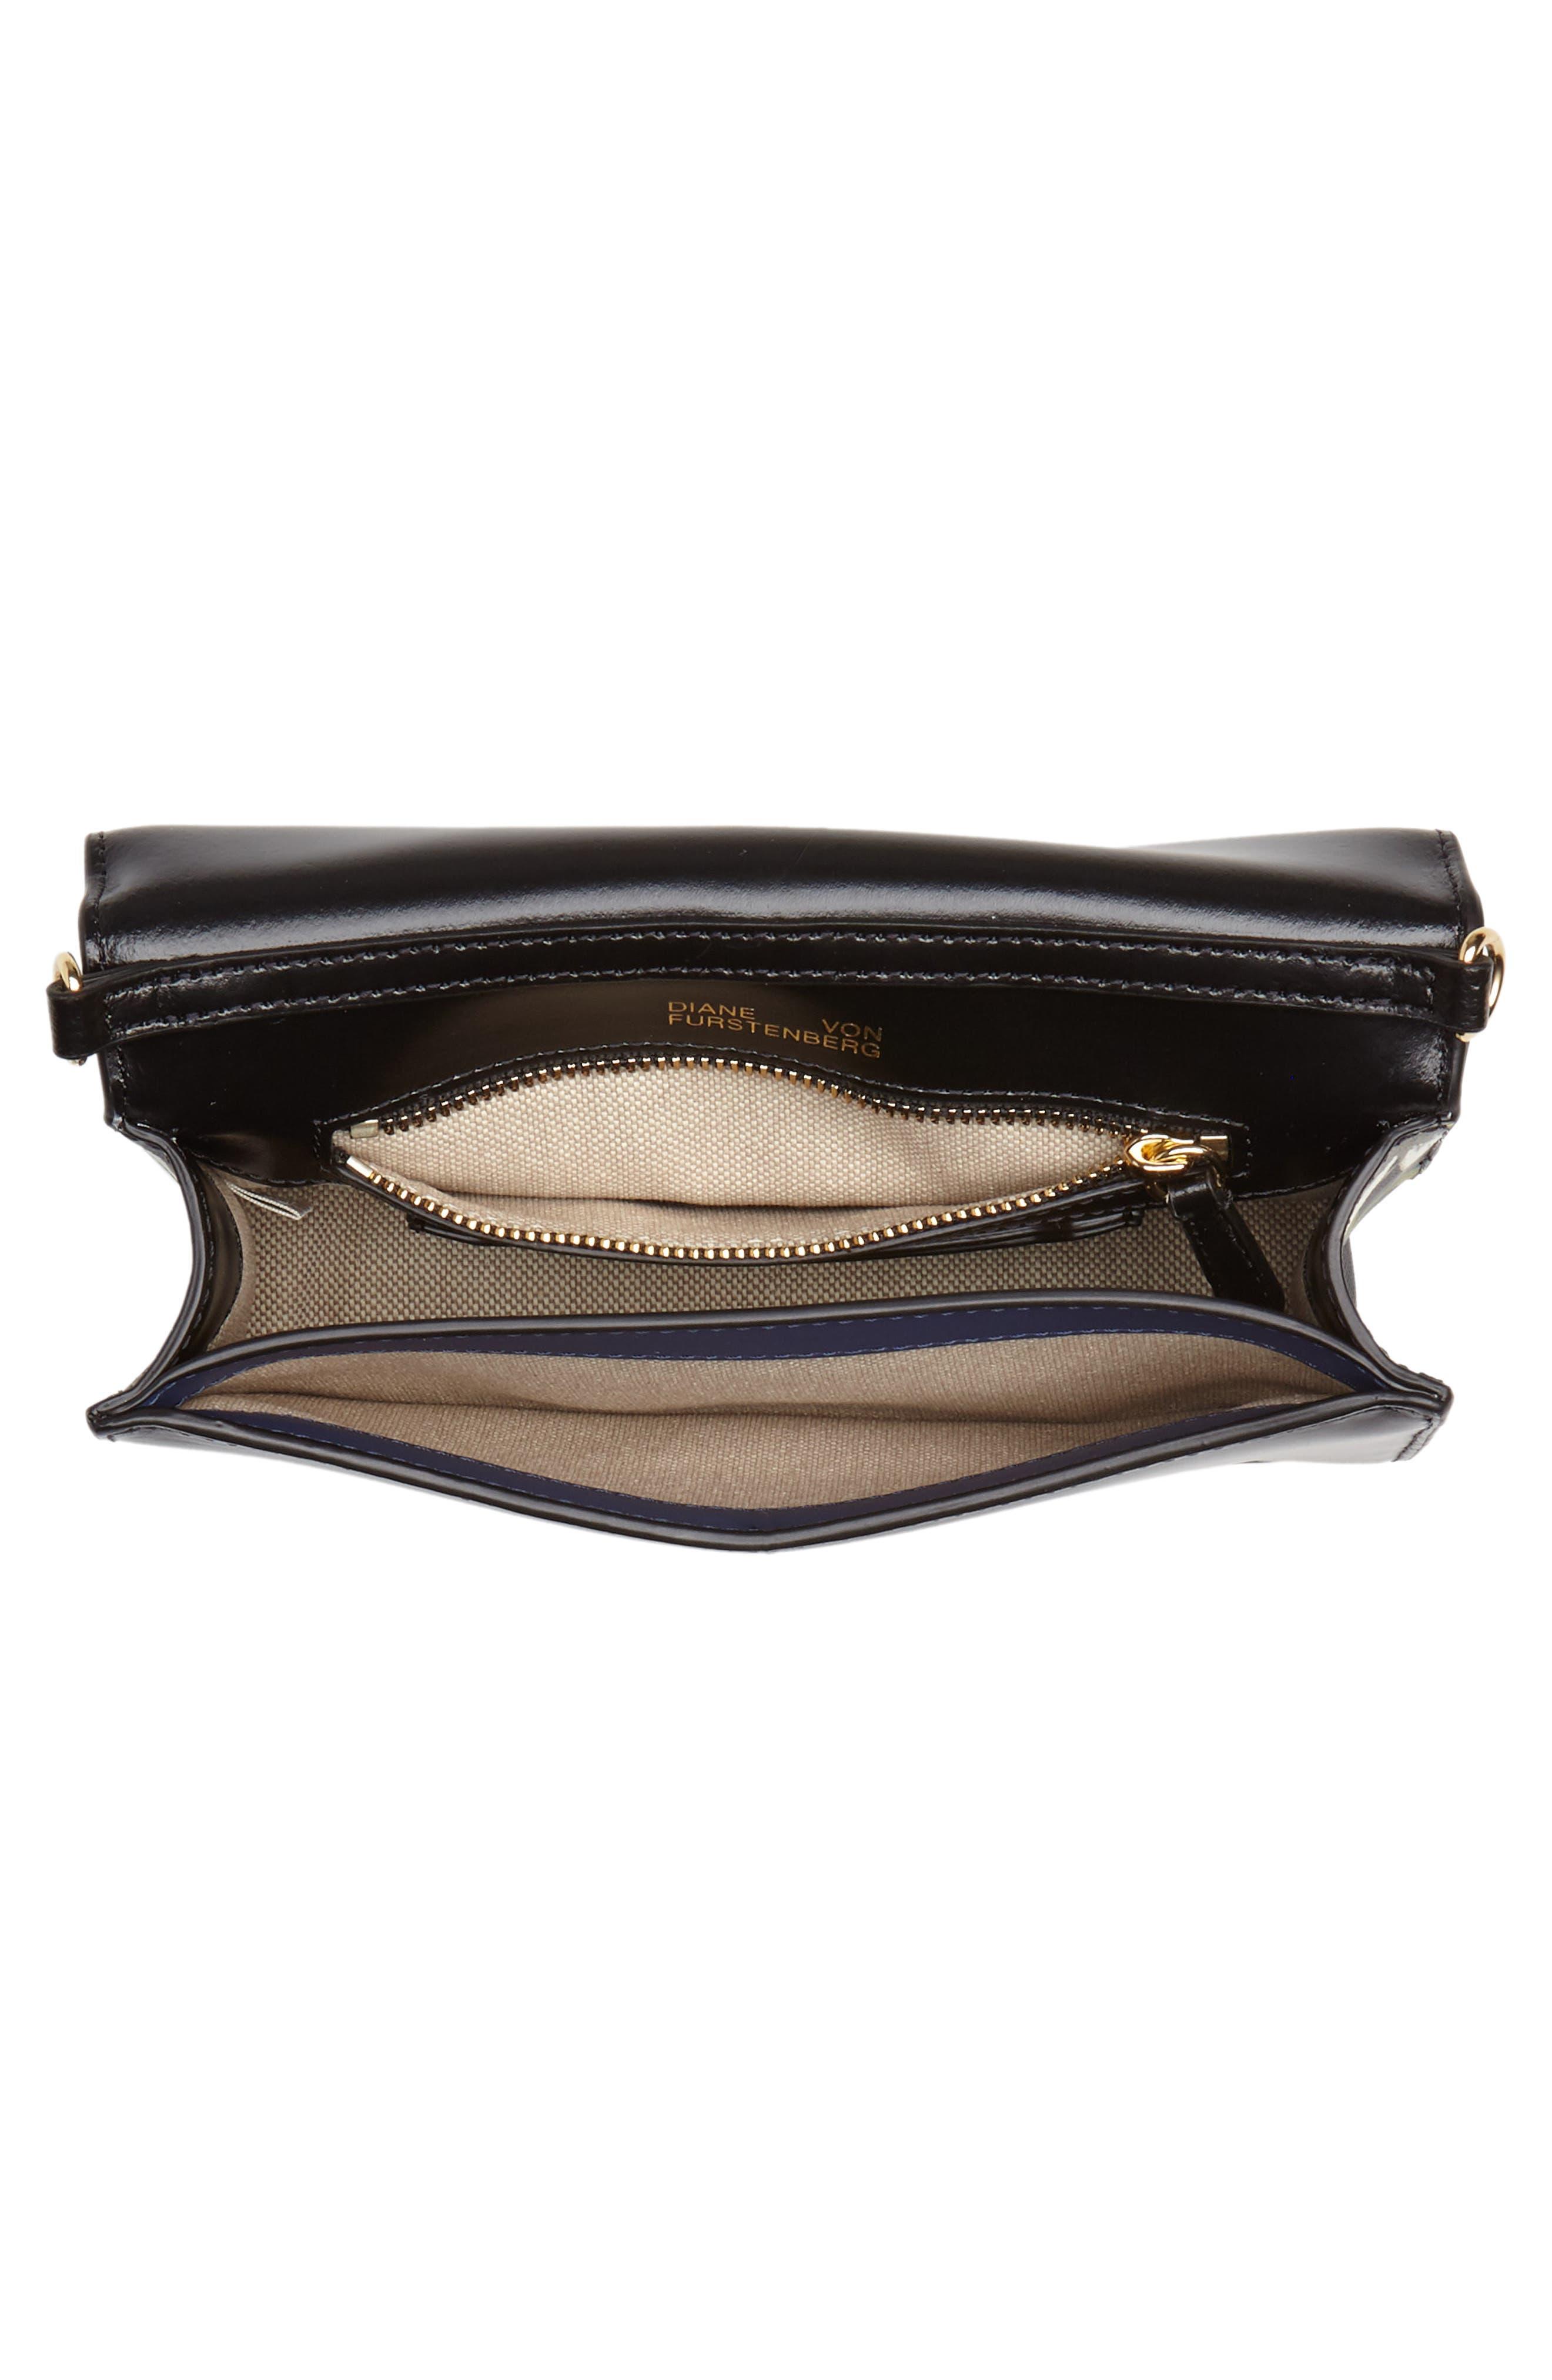 Soirée Leather Convertible Crossbody Bag,                             Alternate thumbnail 5, color,                             001